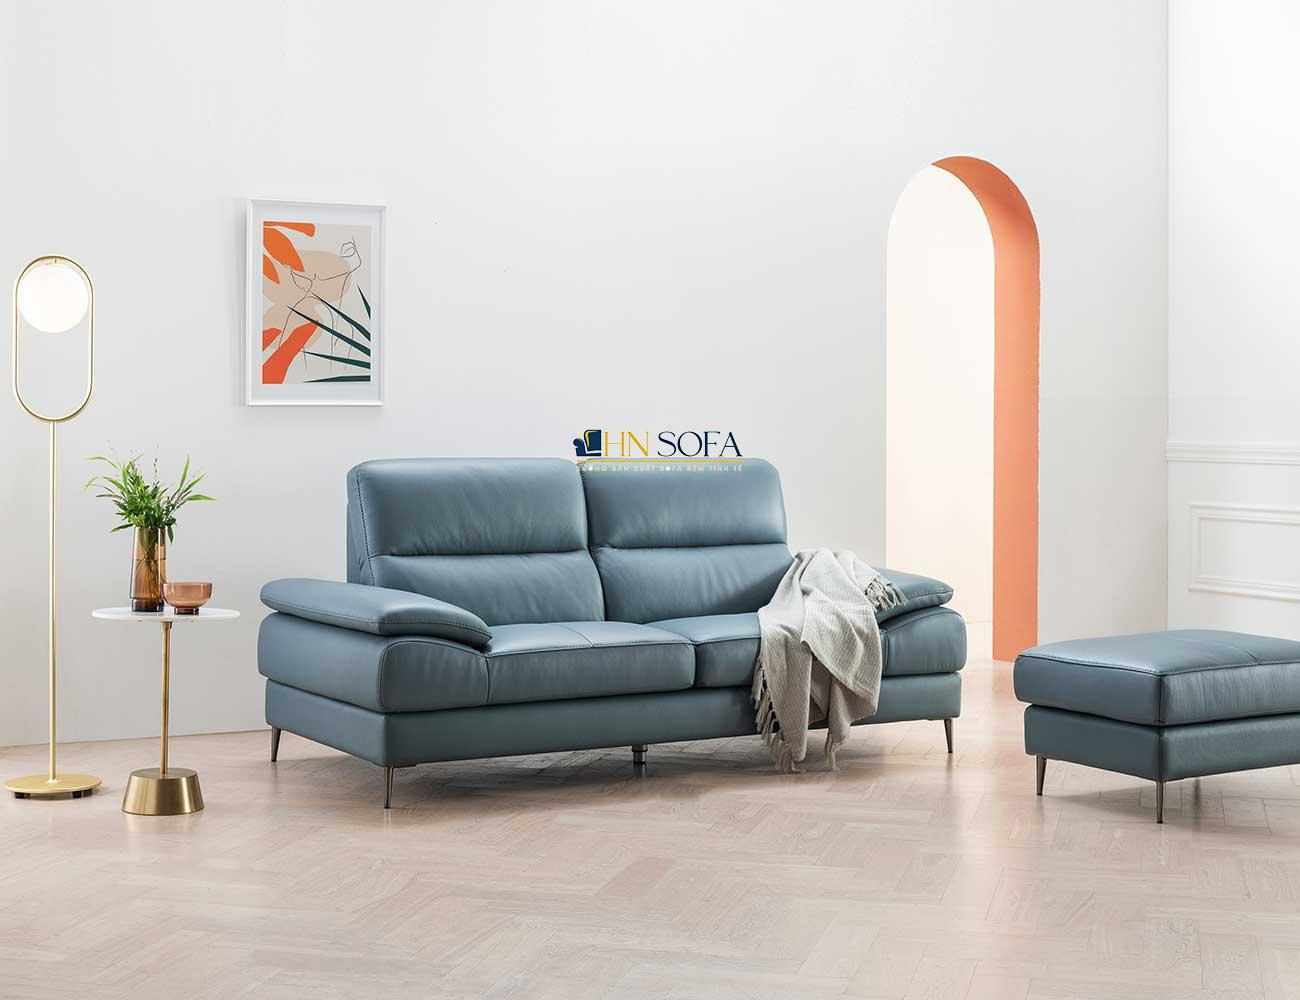 Sofa văng da Malaysia 2 chỗ HNS60